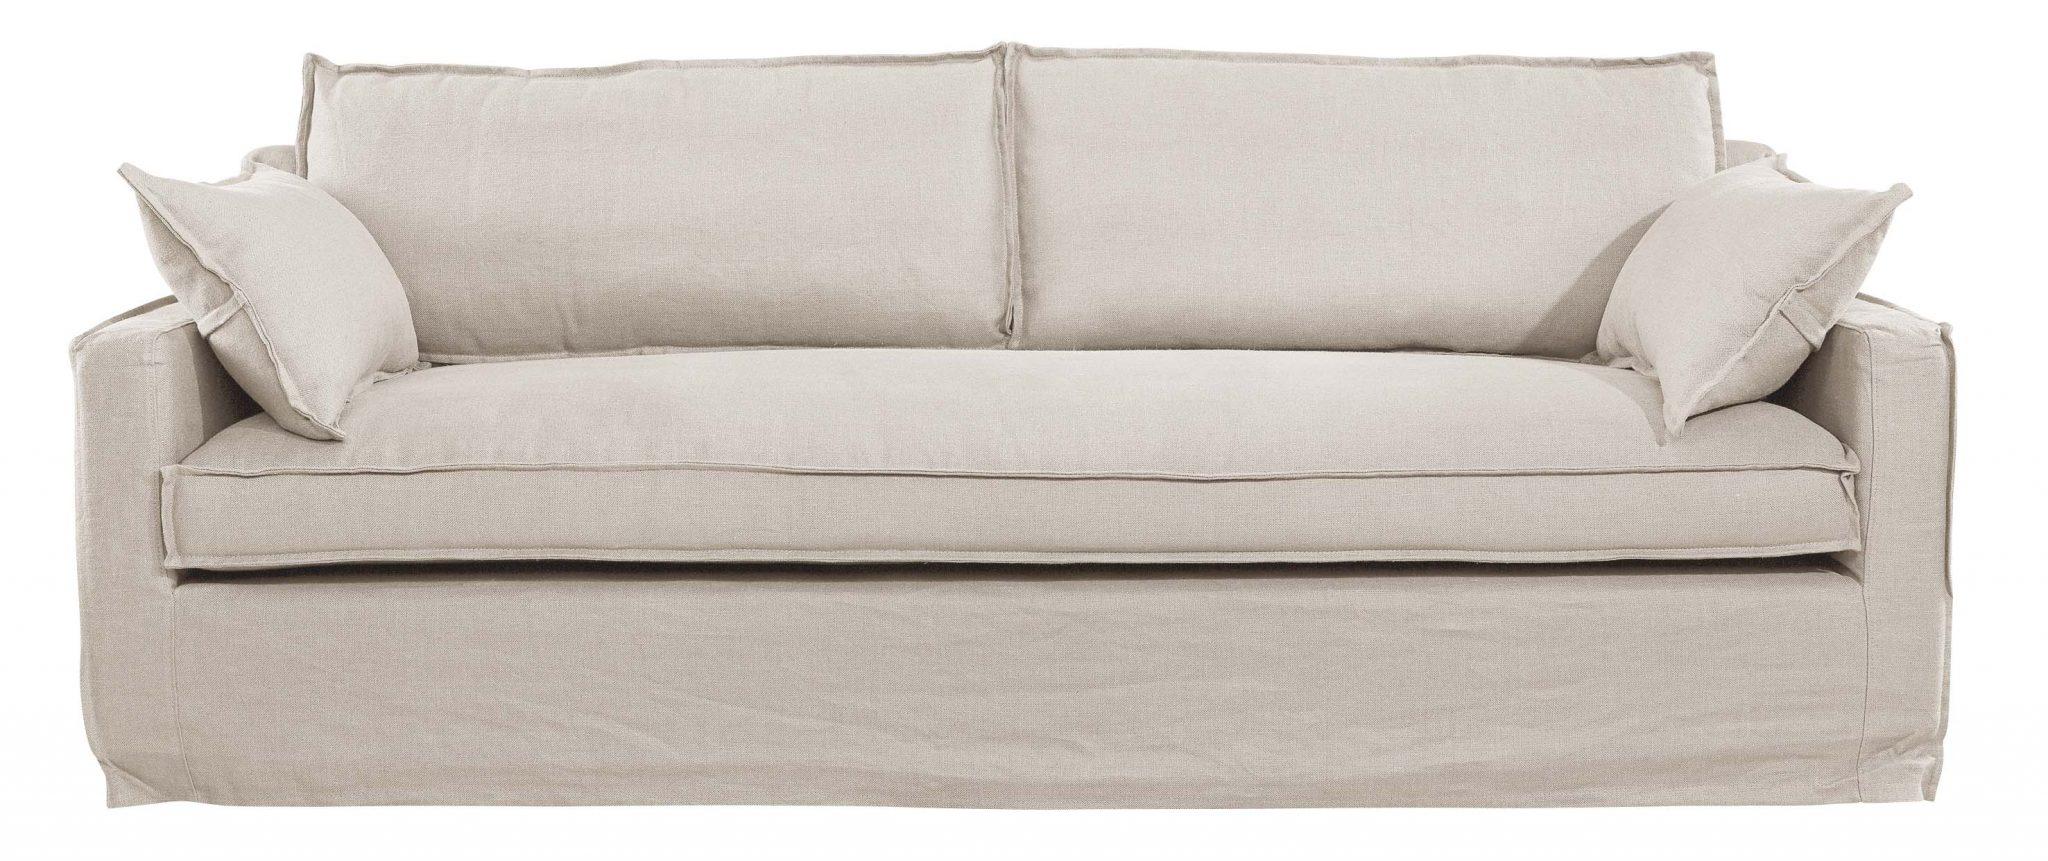 Milford 3 Seater Sofa Sand Artwood